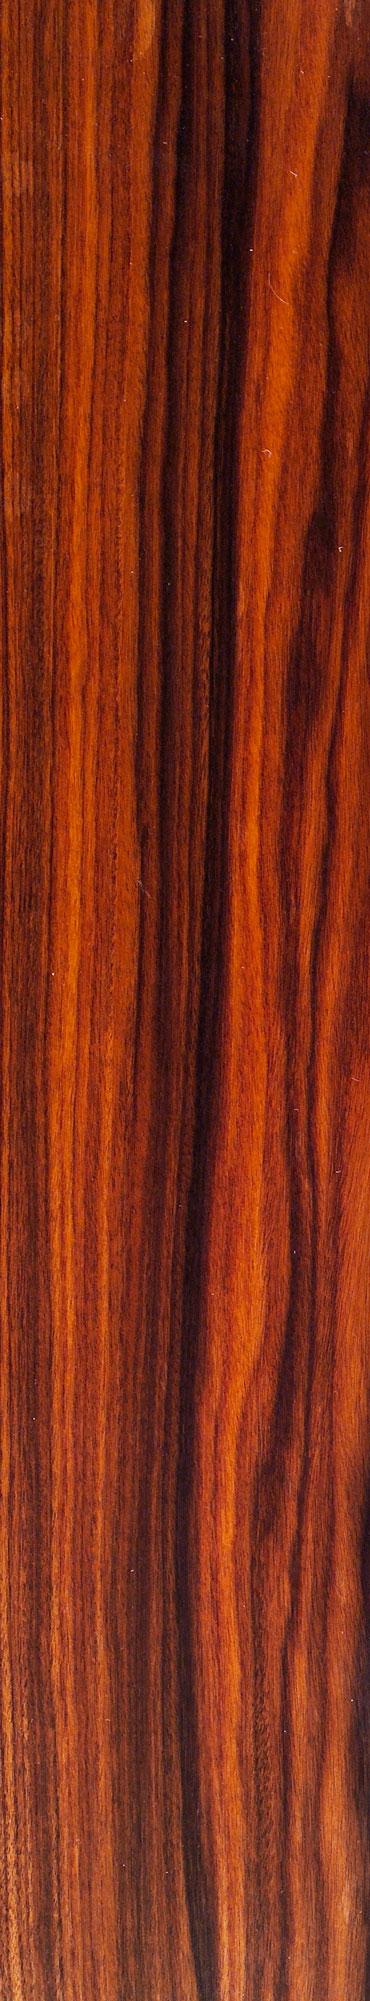 santos palisander furnier schorn groh furniere veneers. Black Bedroom Furniture Sets. Home Design Ideas